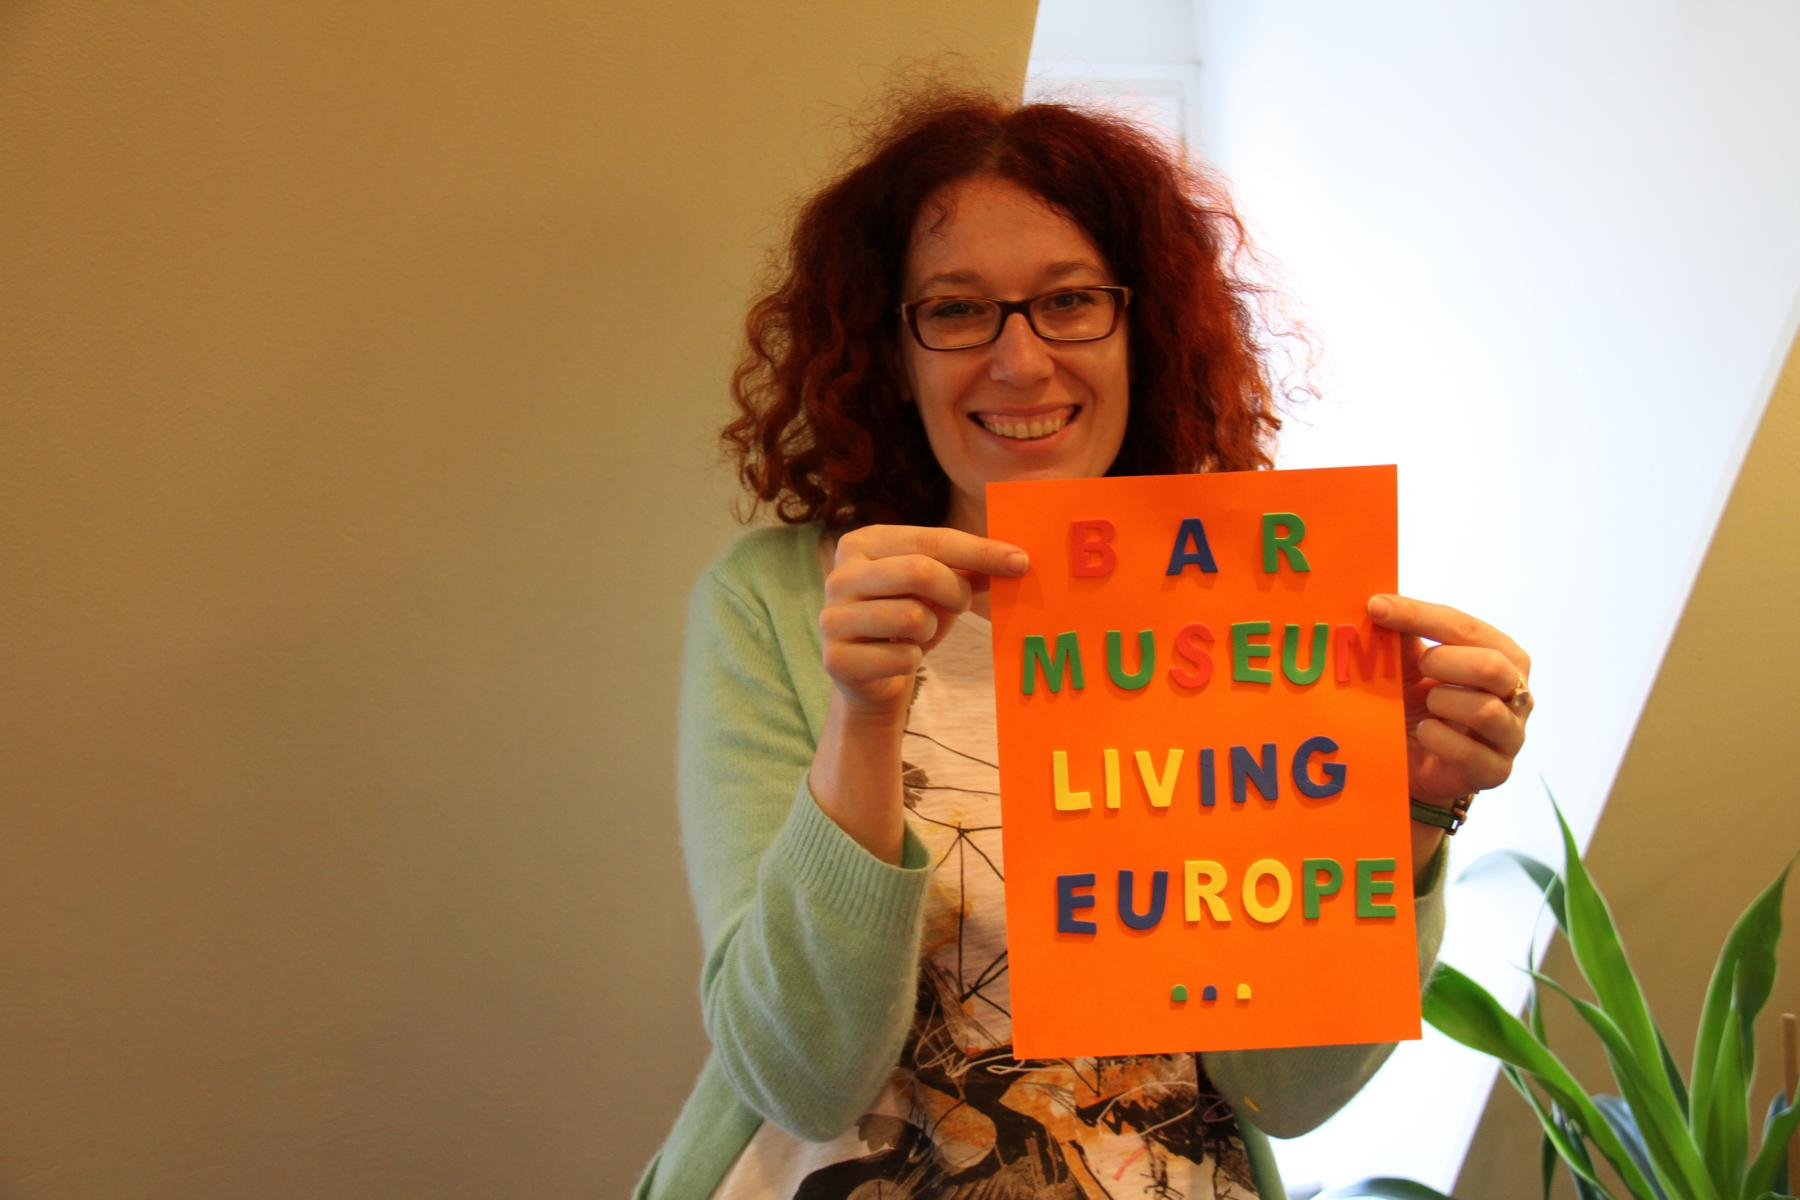 BAR Museum Living Europe